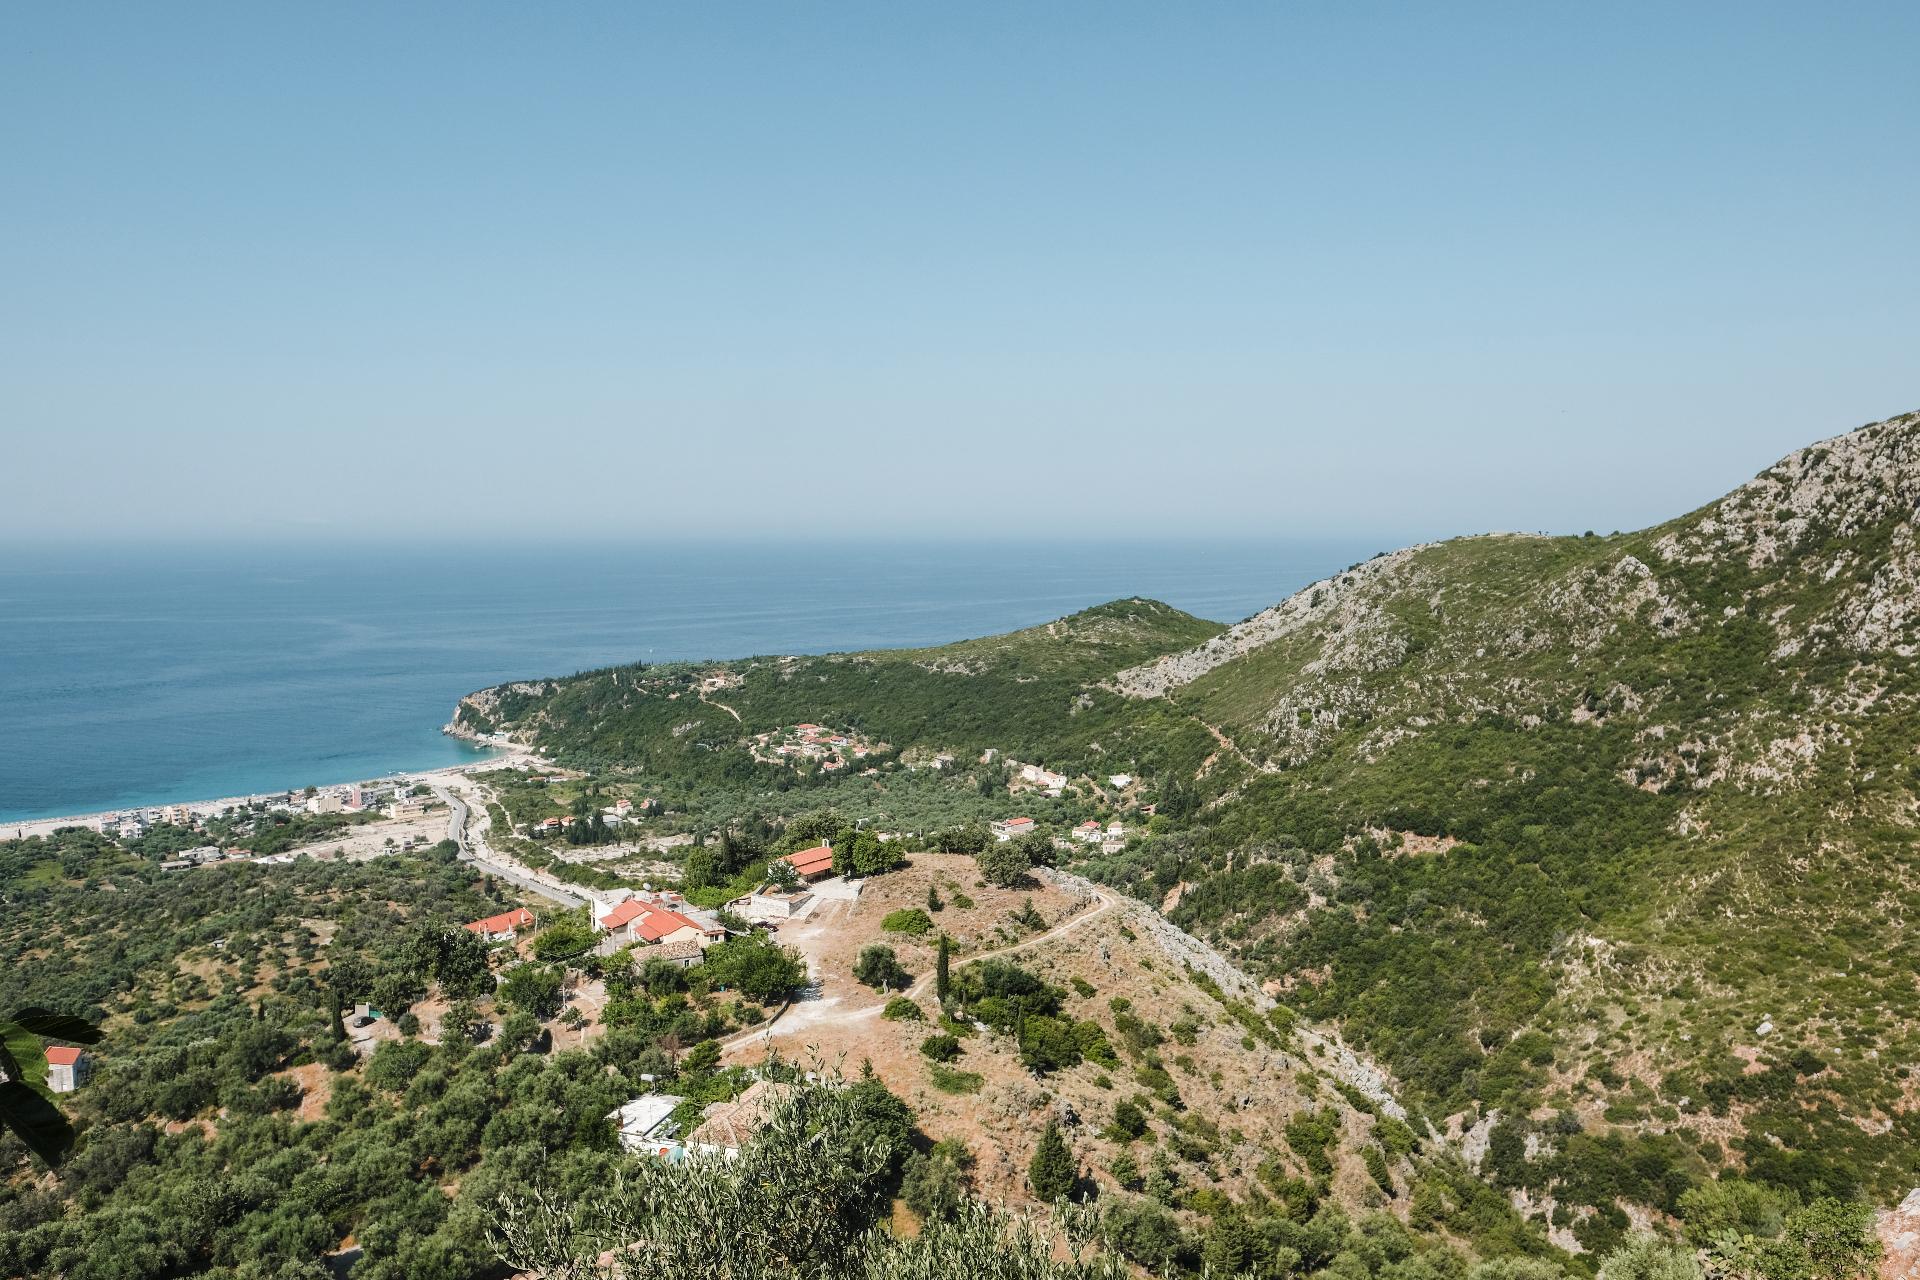 Albania road trip, landscape and beach